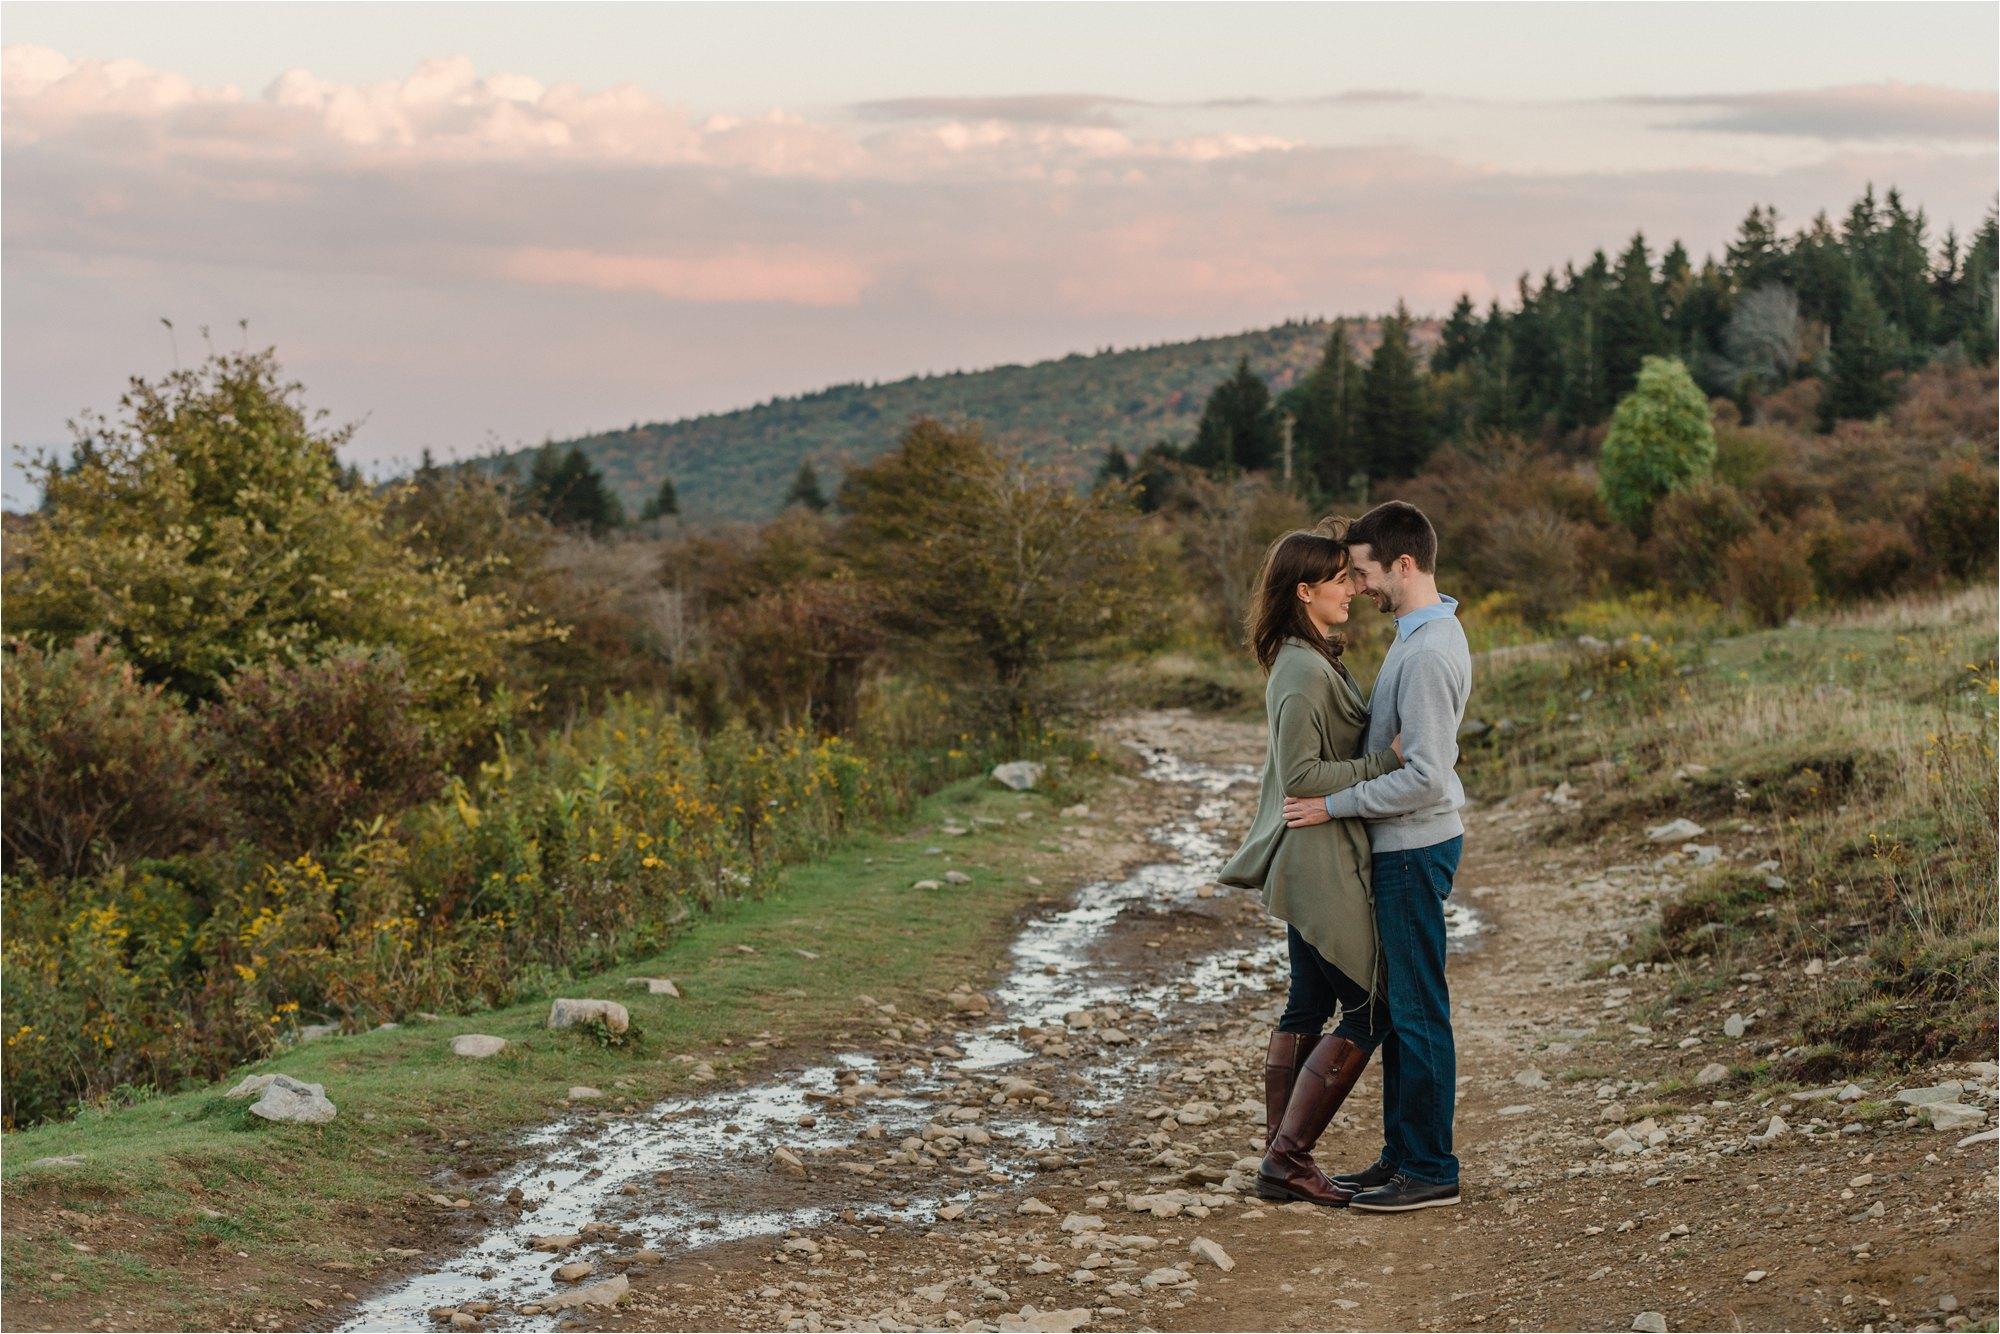 Engagement Photos at Blue Ridge Mountains